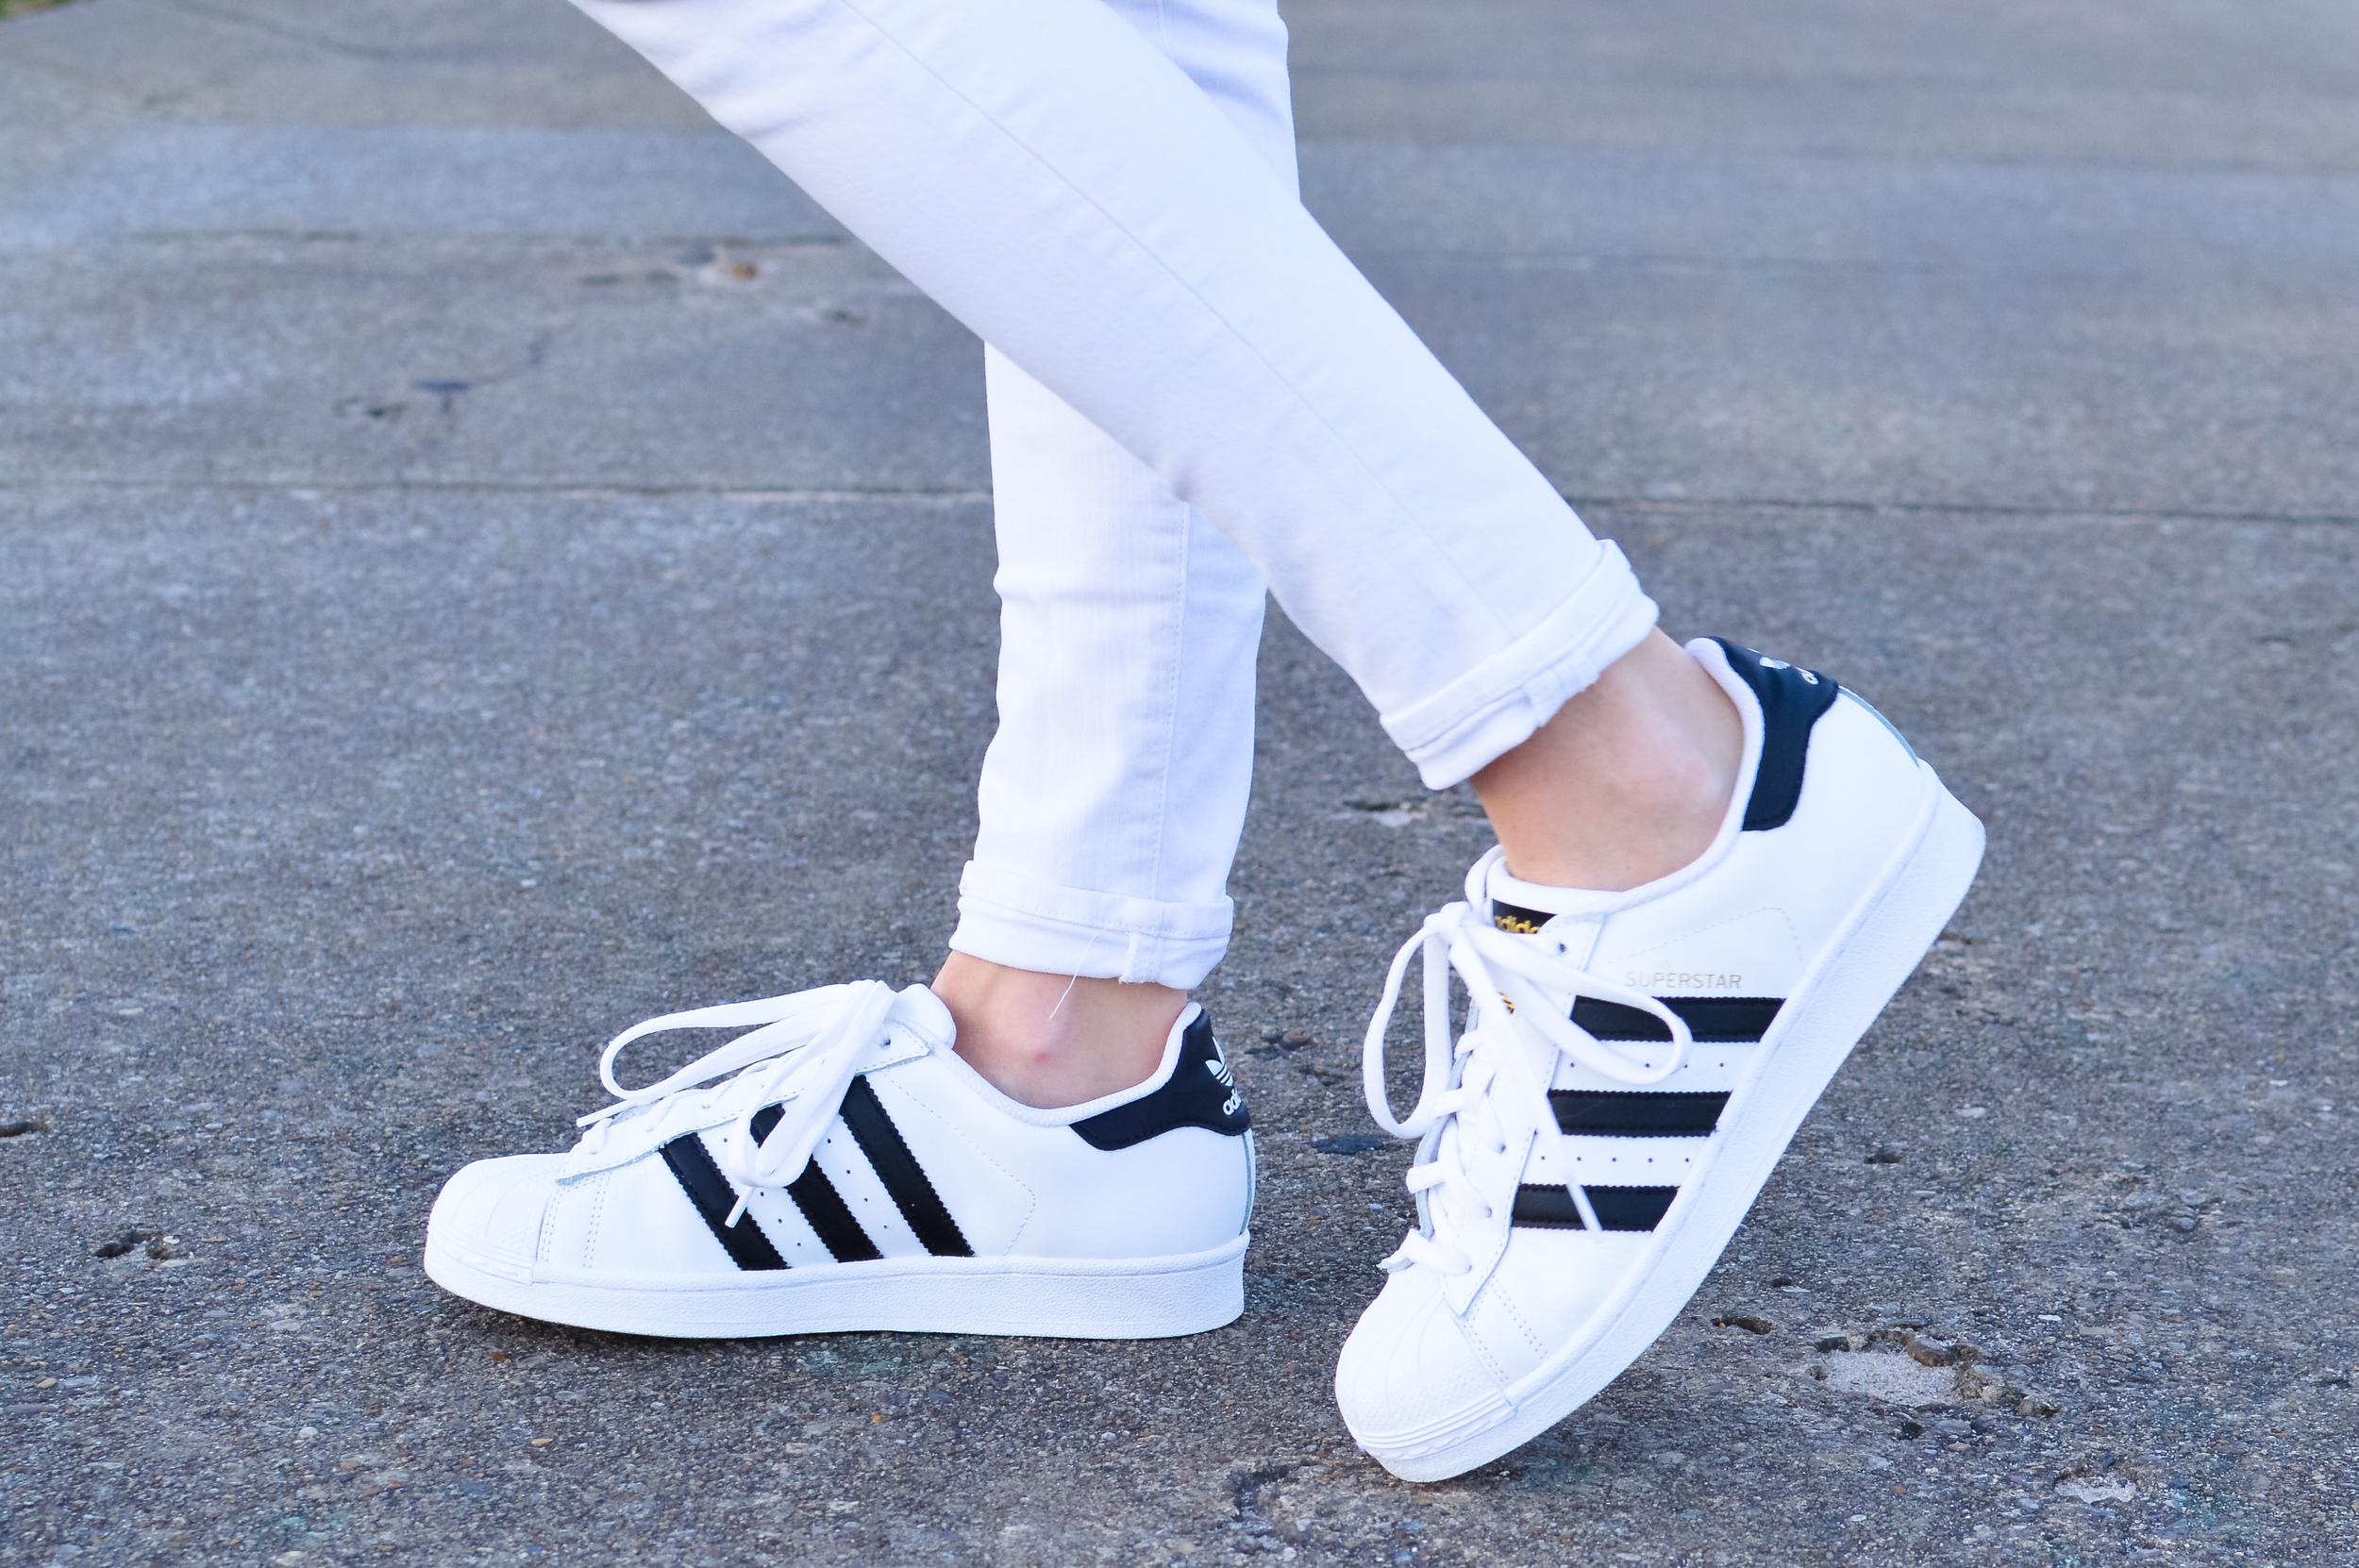 lcb_style_striped_tee_adidas_superstar (20 of 23).jpg